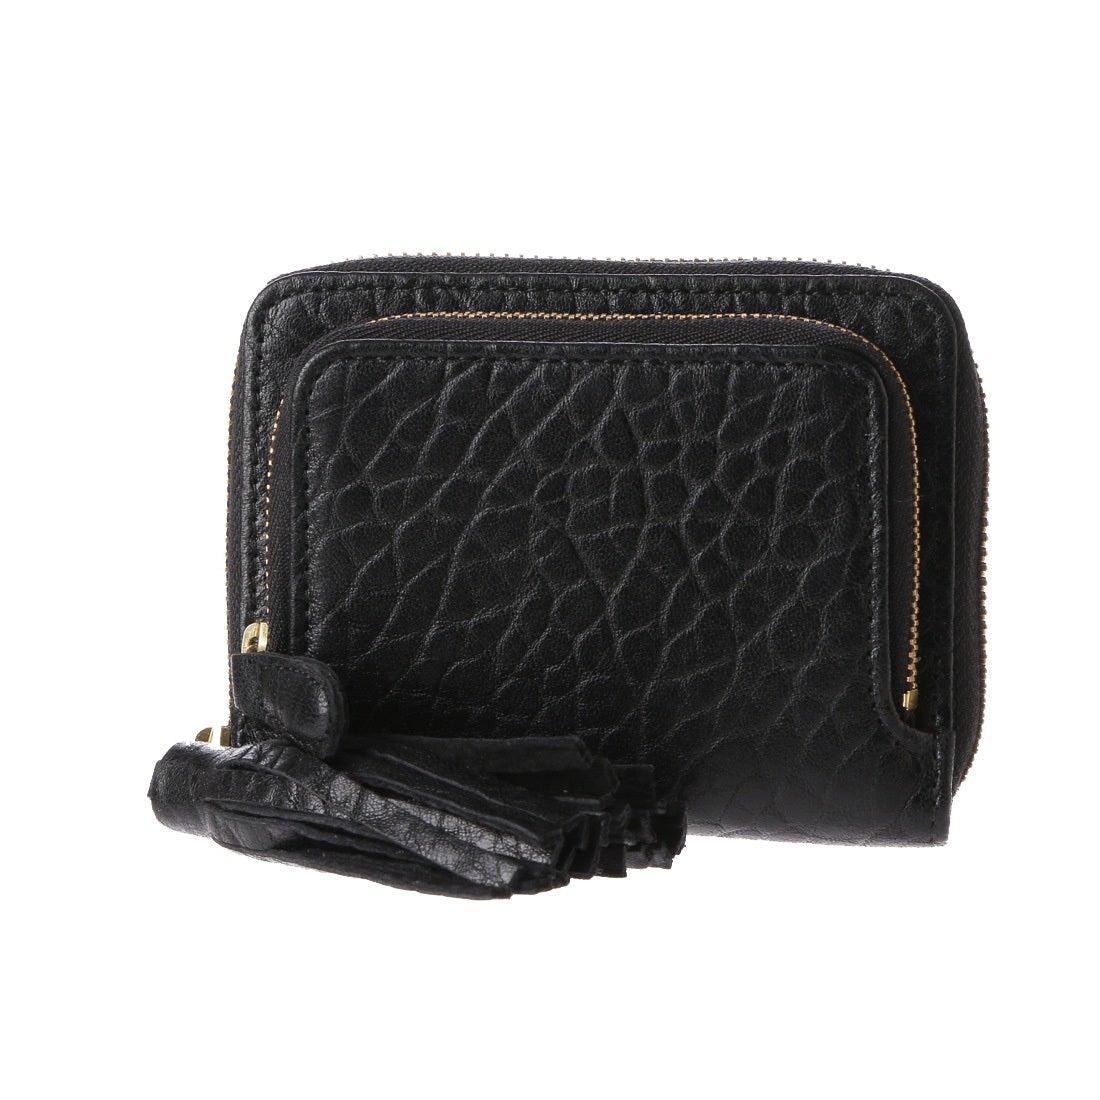 5e33fce2c86c ペルケ perche 厚口シープタッセル付き二つ折り財布 (ブラック) -靴&ファッション通販 ロコンド〜自宅で試着、気軽に返品